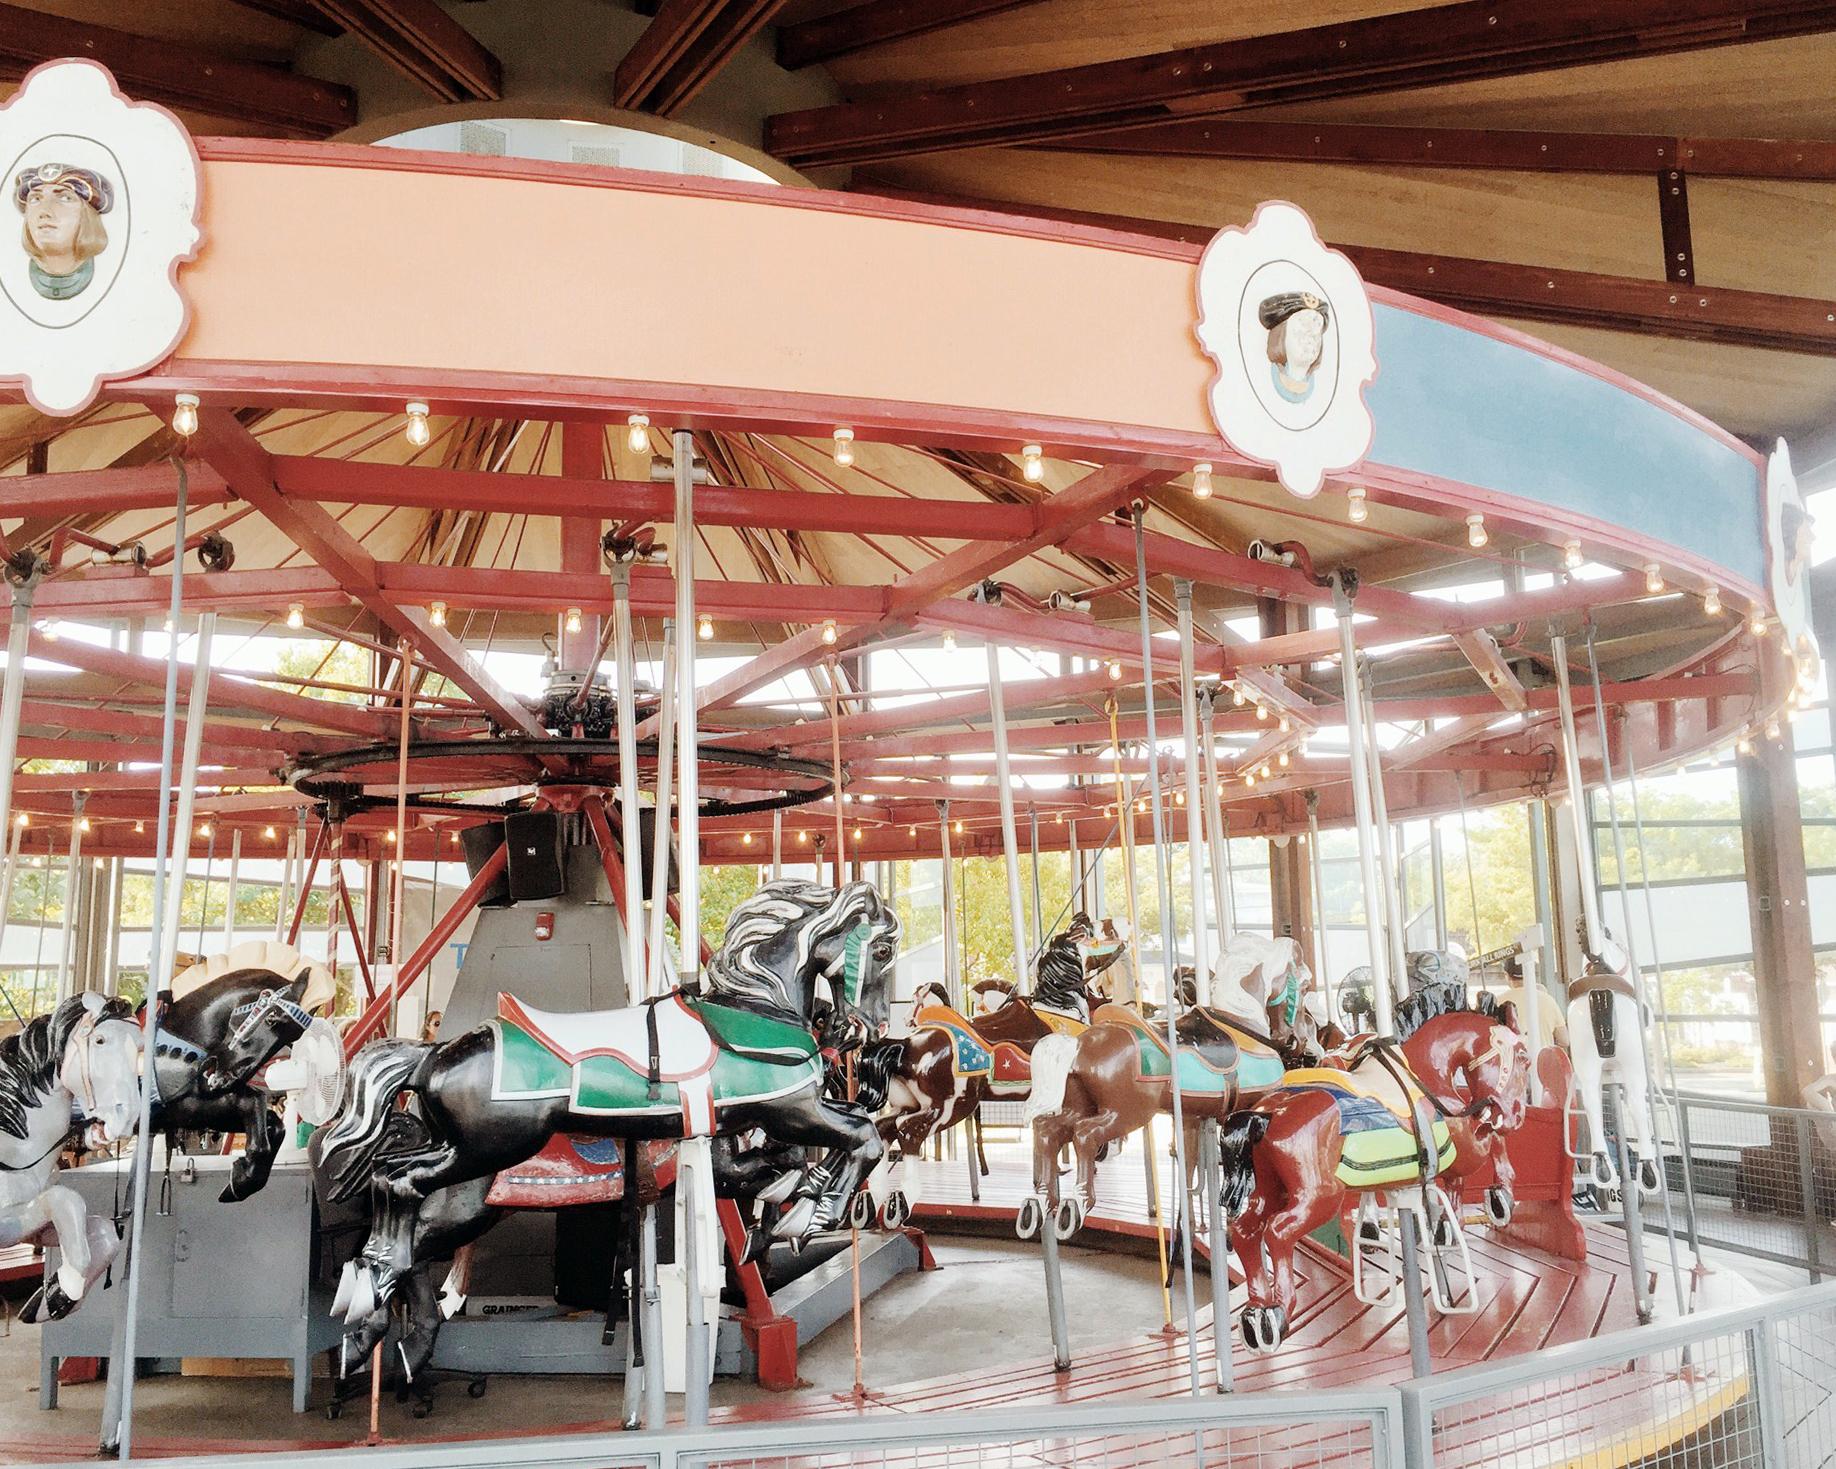 Greenport Village Carousel